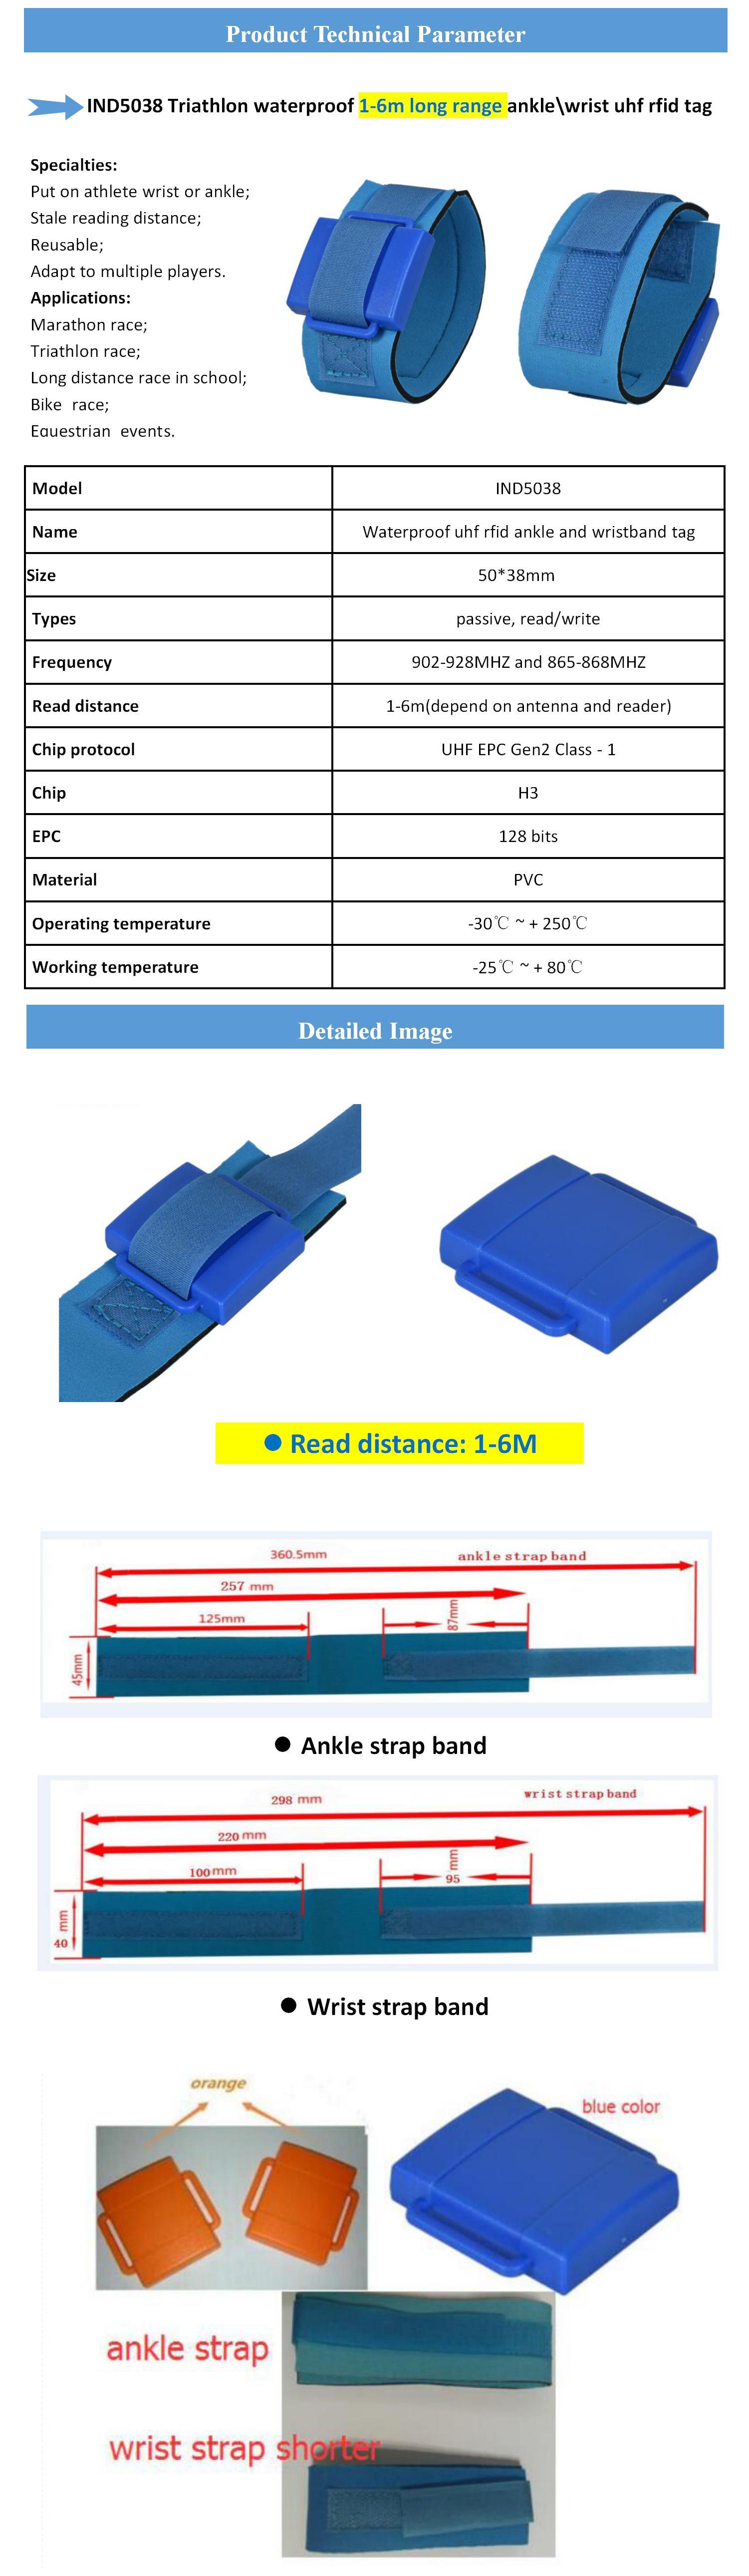 Marathon timing system1-6m 수동적 인 uhf rfid 발목 팔찌 hl 태그와 PVC reusable 6mm'6 * 트라이 애슬론 불어 넣어주는 system